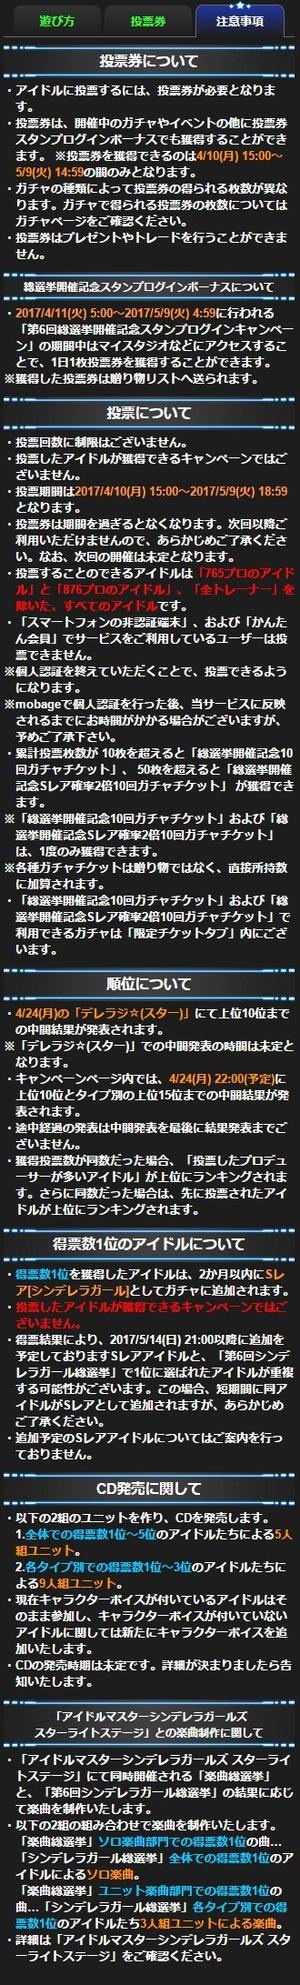 2017-04-10_212819